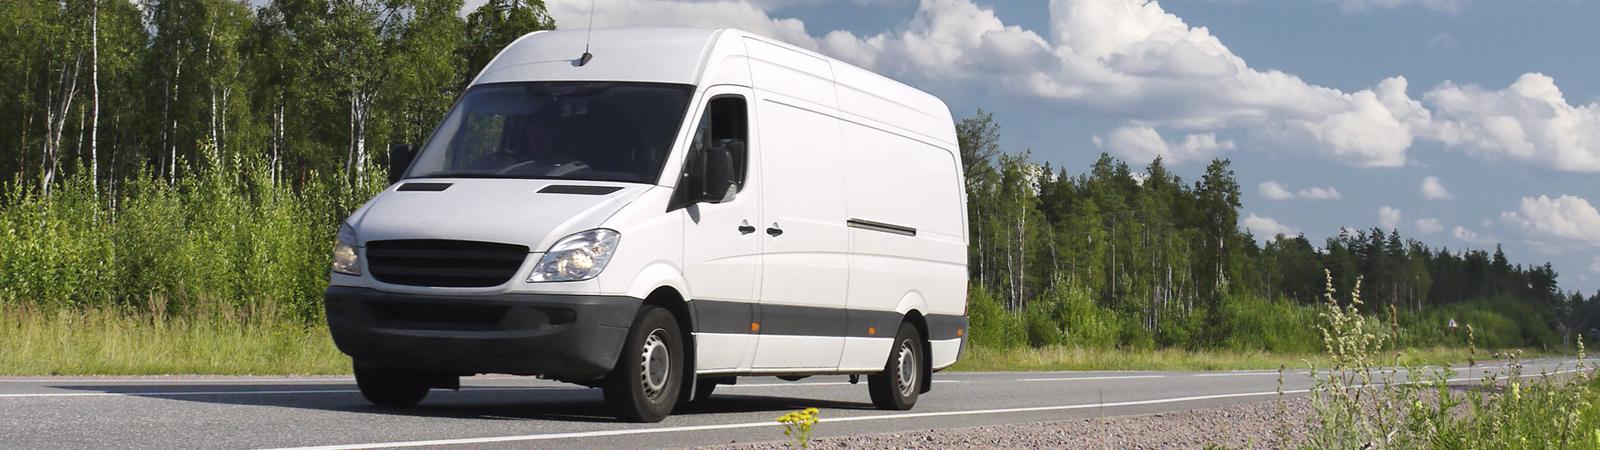 Installsure Van Insurance